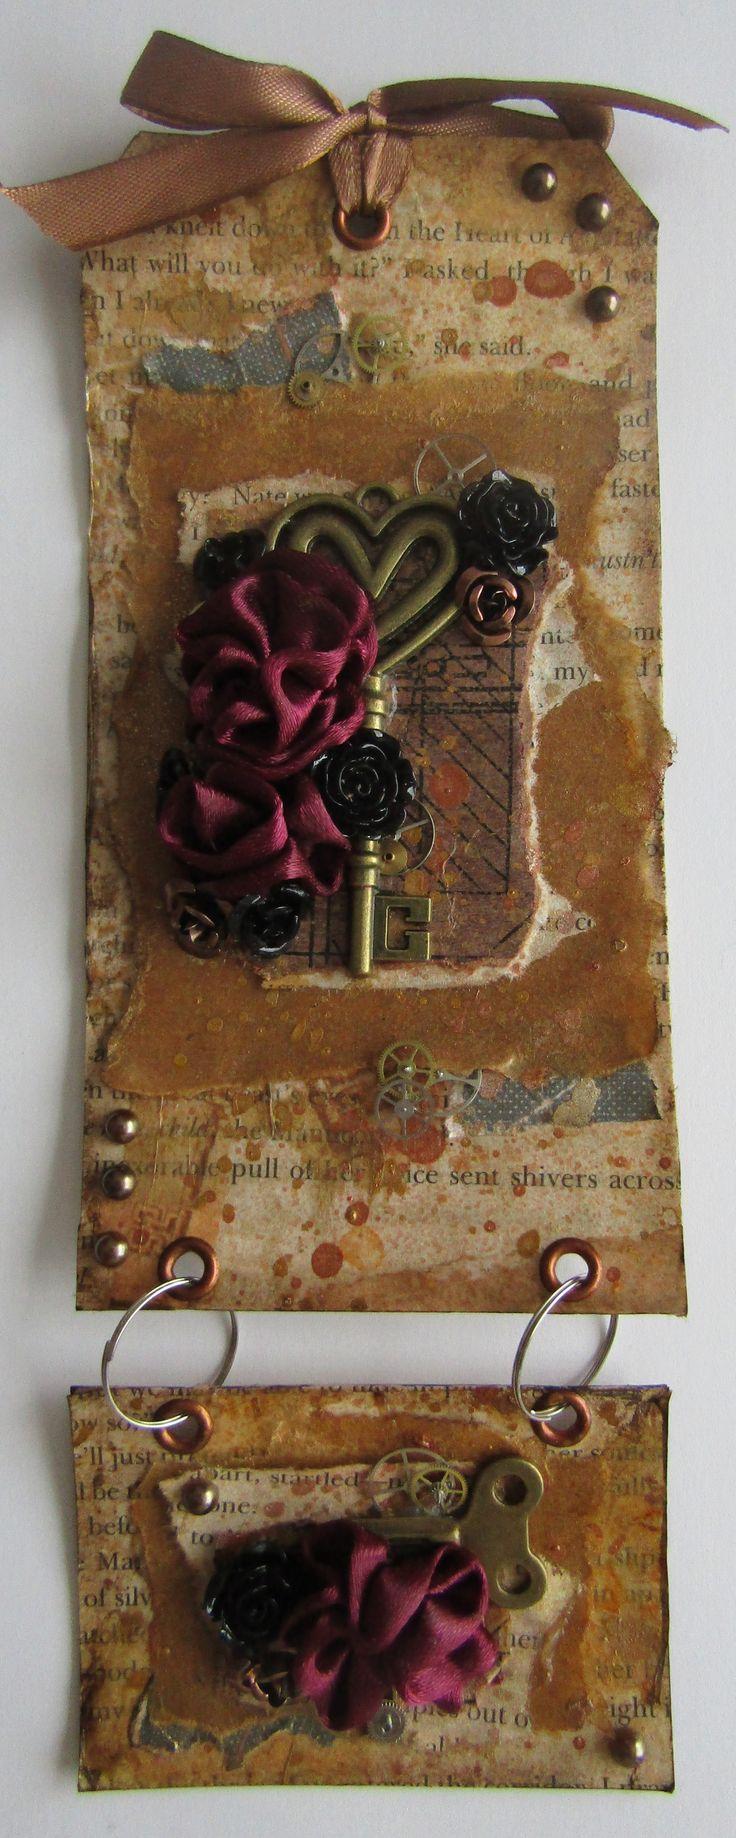 Tag made using items craft box #GemmaHynes #Handmadegifttags